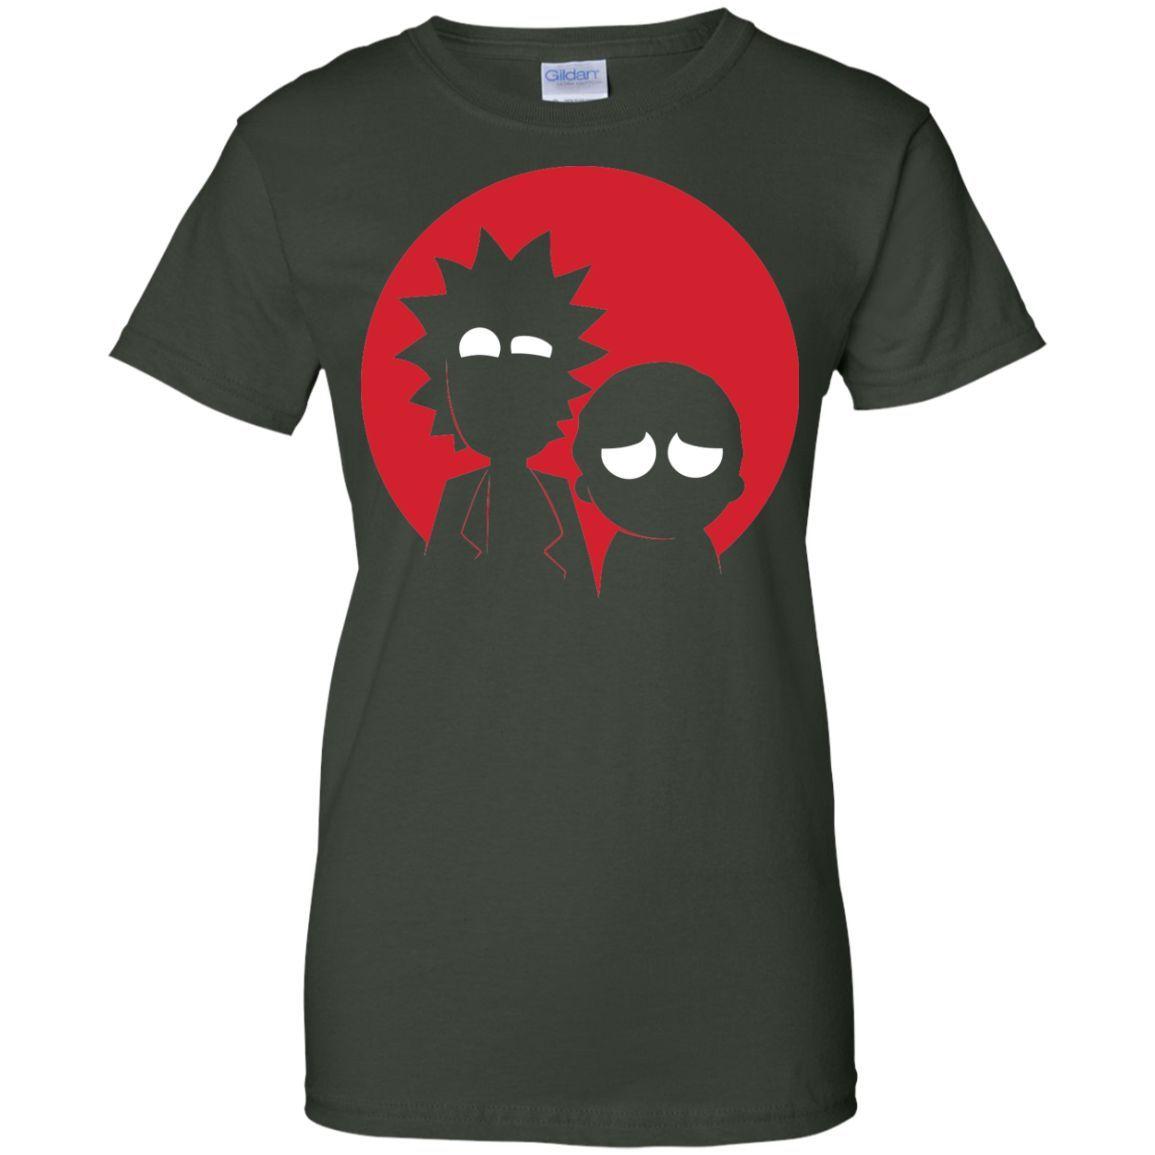 Rick & morty 16-01 Ladies Custom 100% Cotton T-Shirt